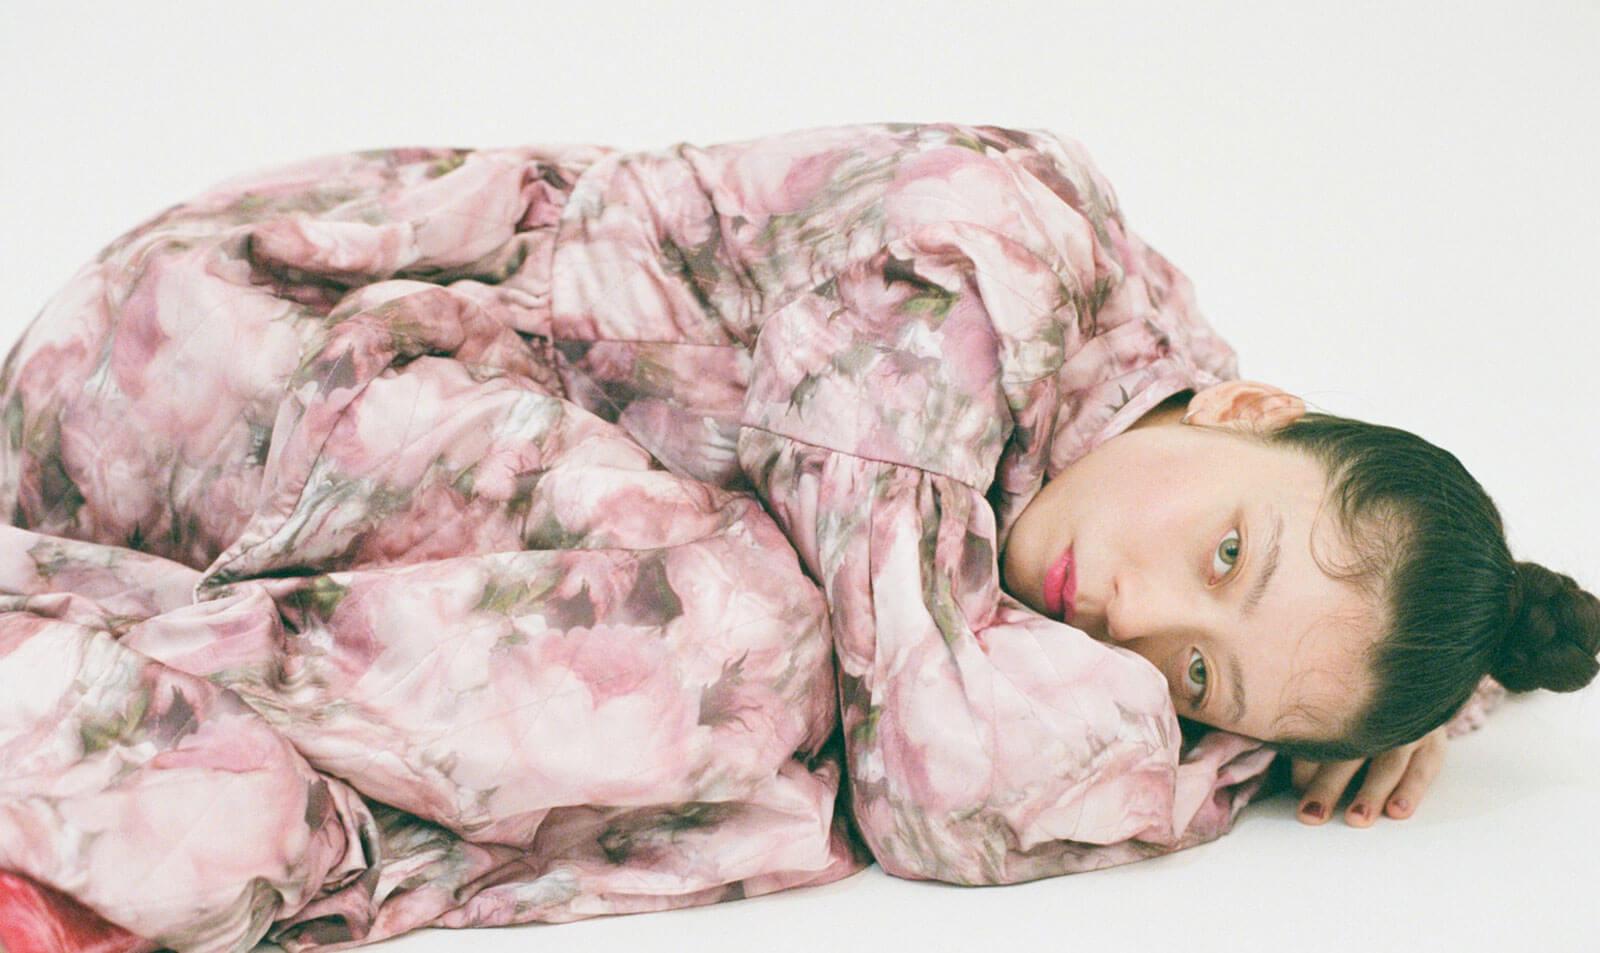 Encounter|Takahiro Otsuji & Sumire